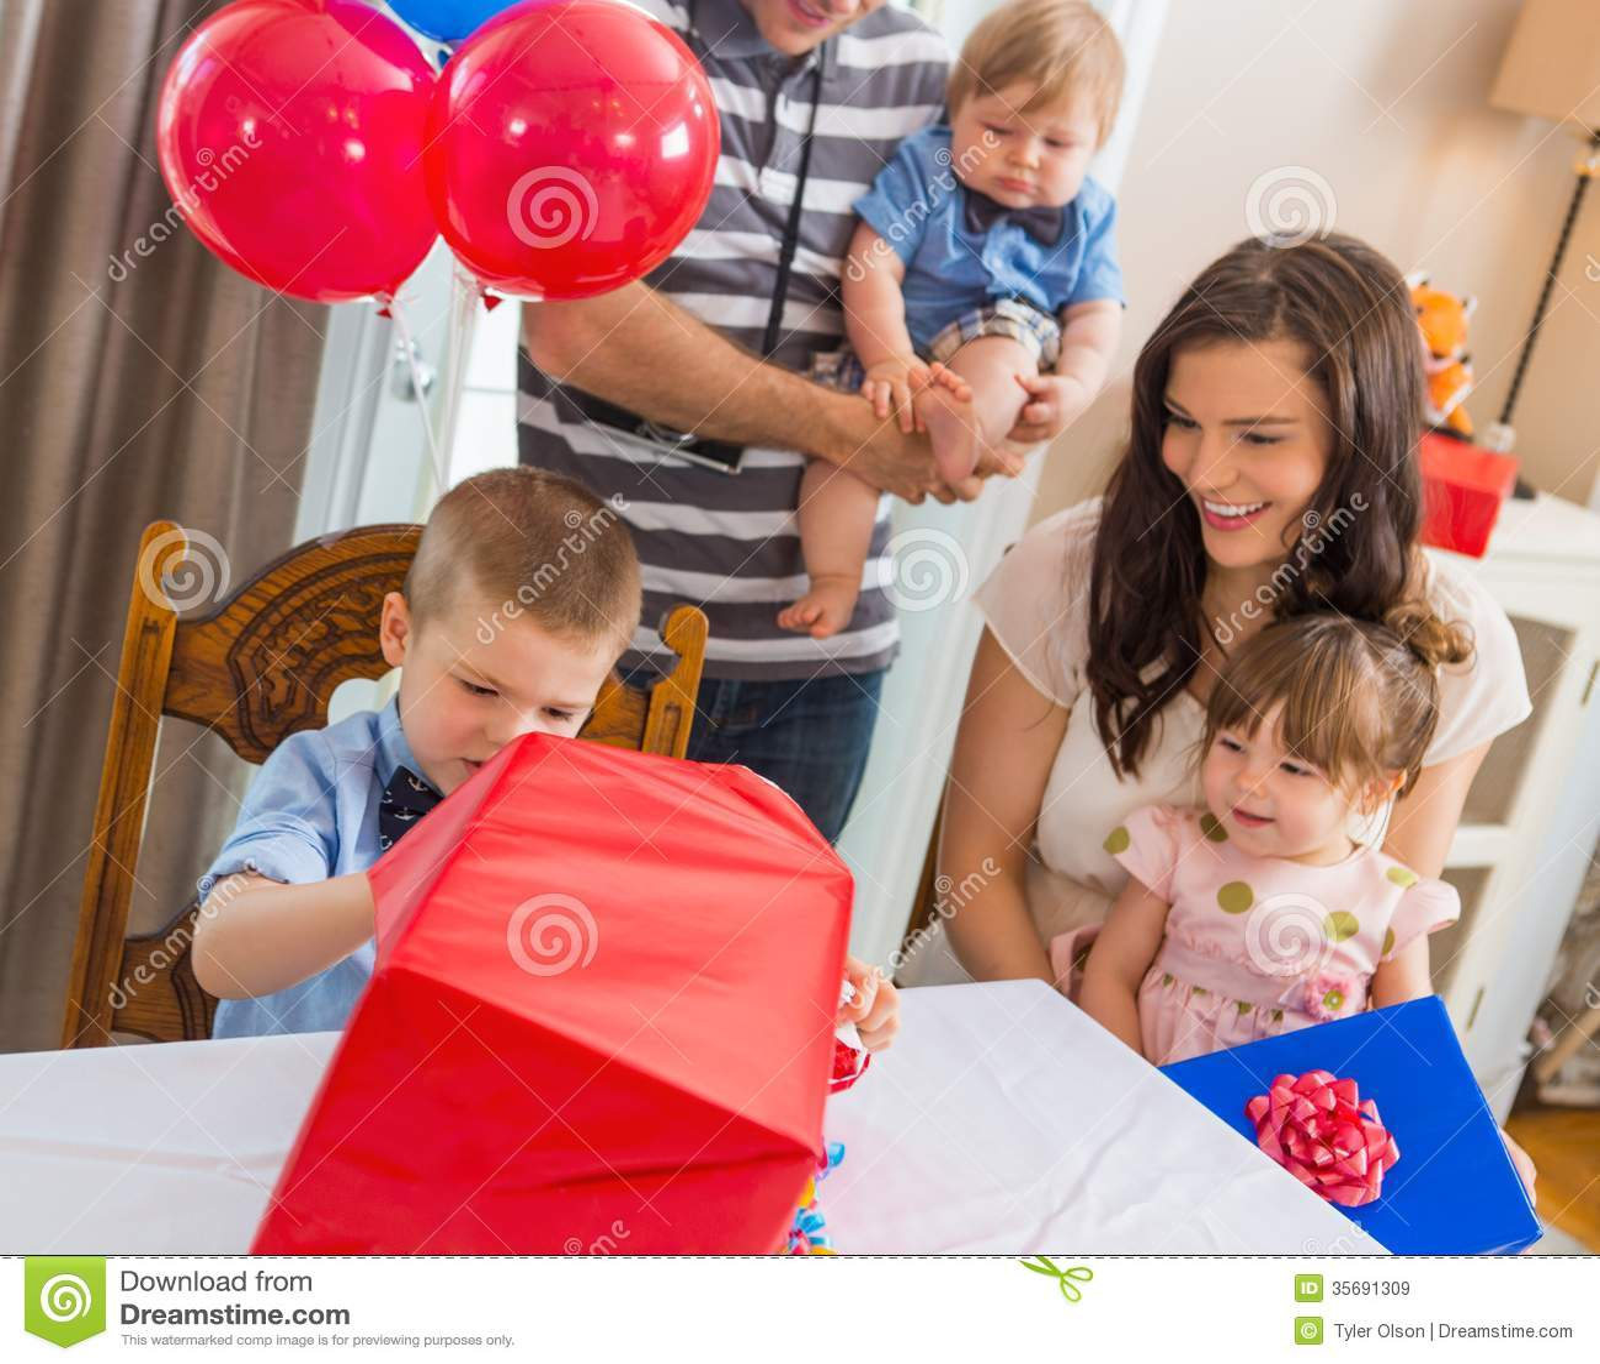 Family Looking At Birthday Boy Opening Gift Box Royalty